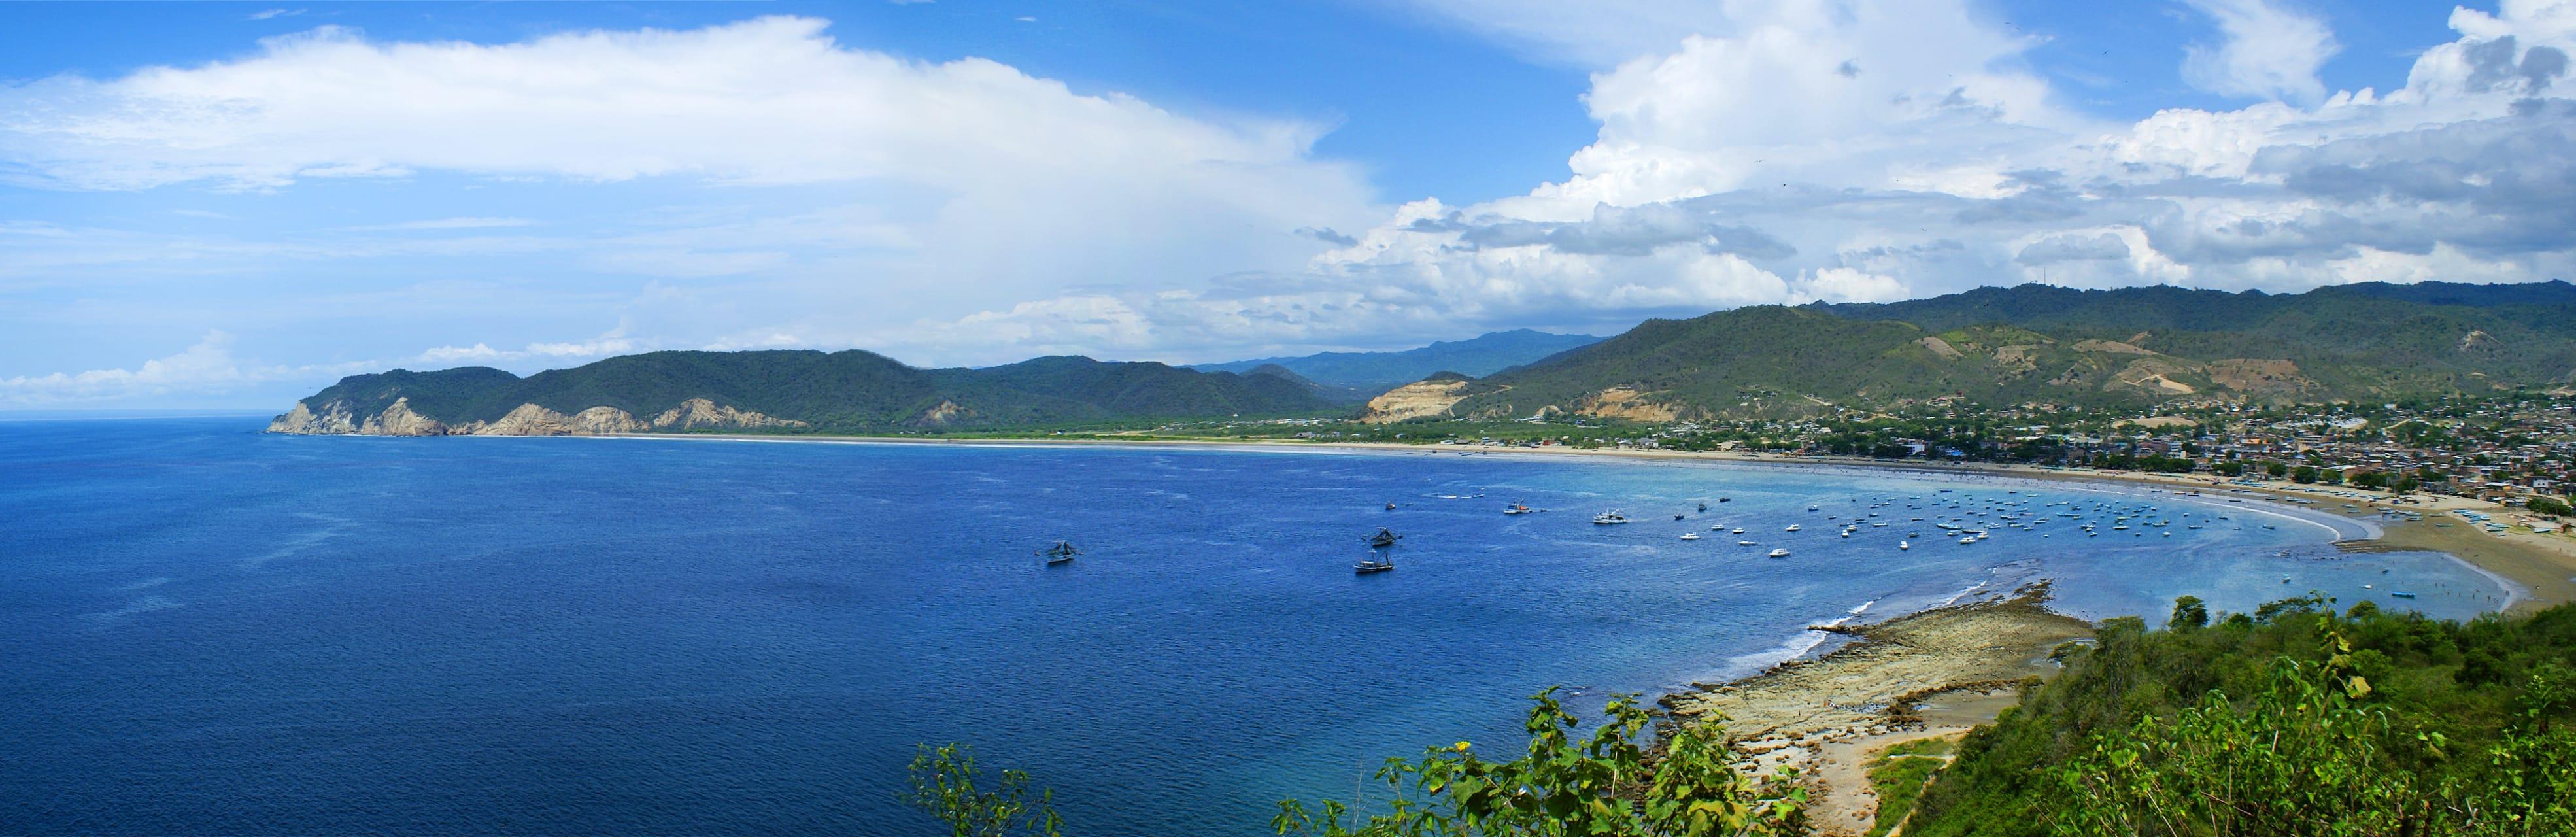 Puerto Lopez cover image